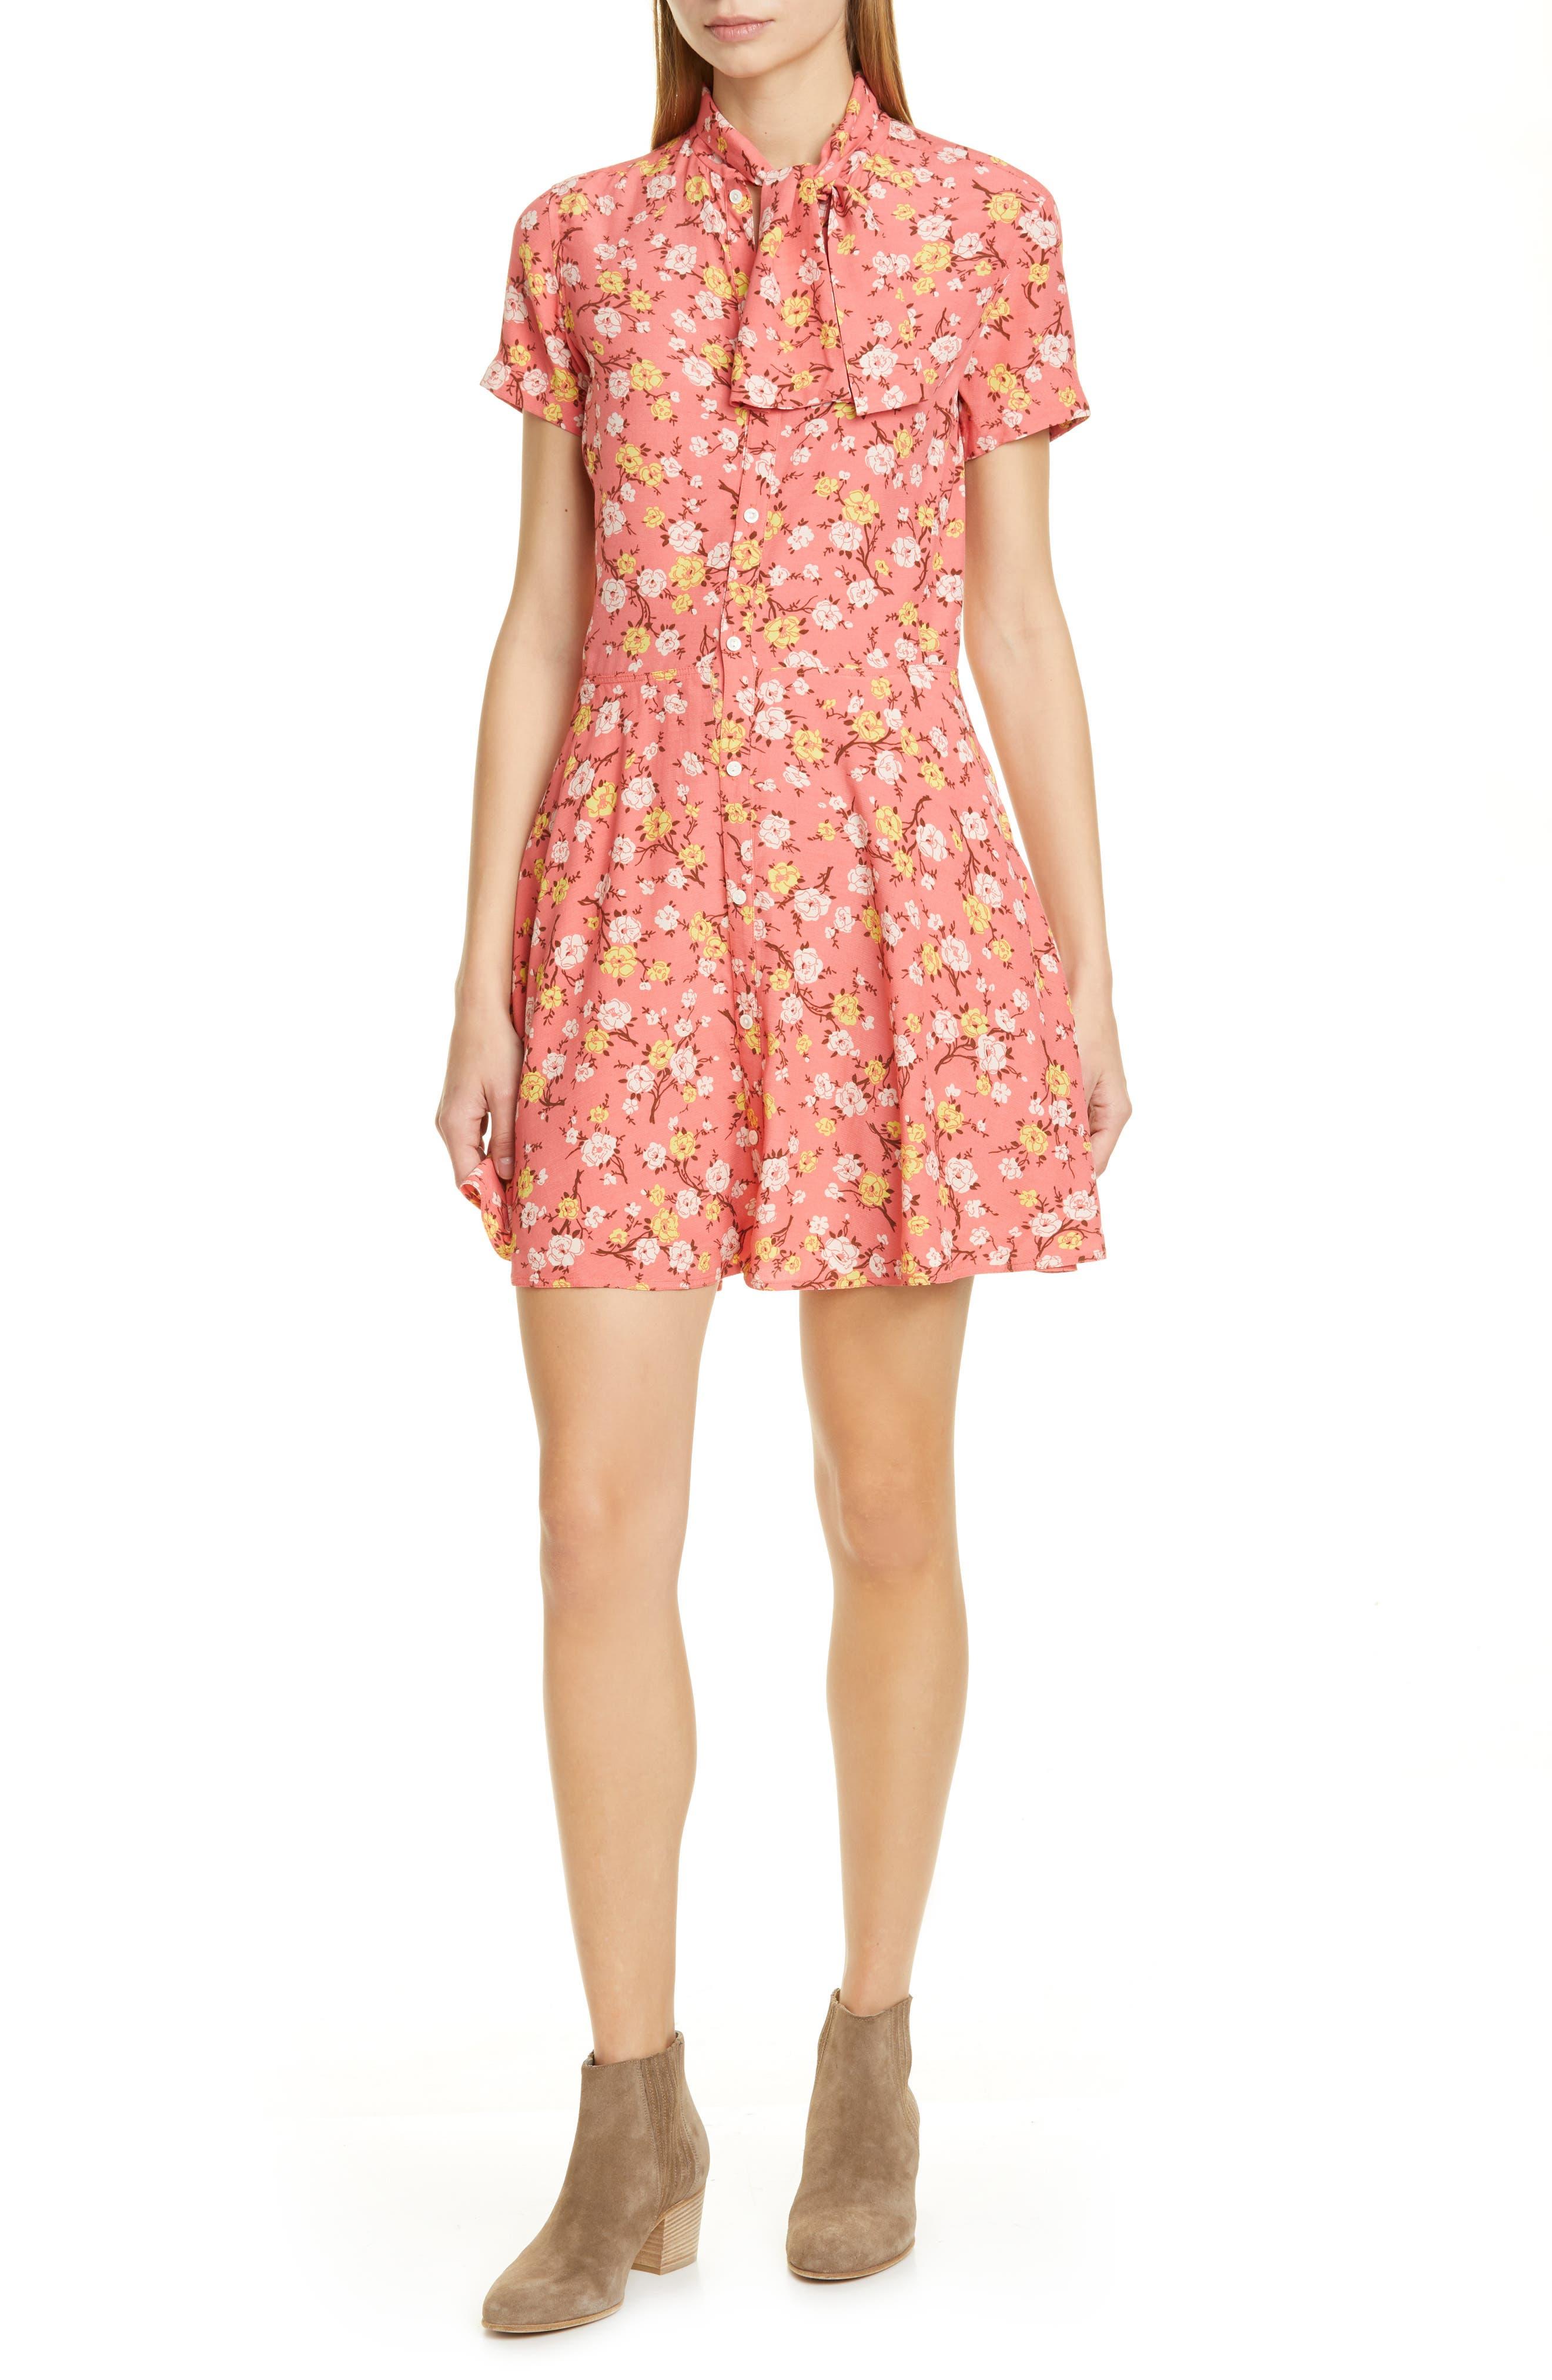 Polo Ralph Lauren Floral Tie Neck Fit & Flare Dress, Pink